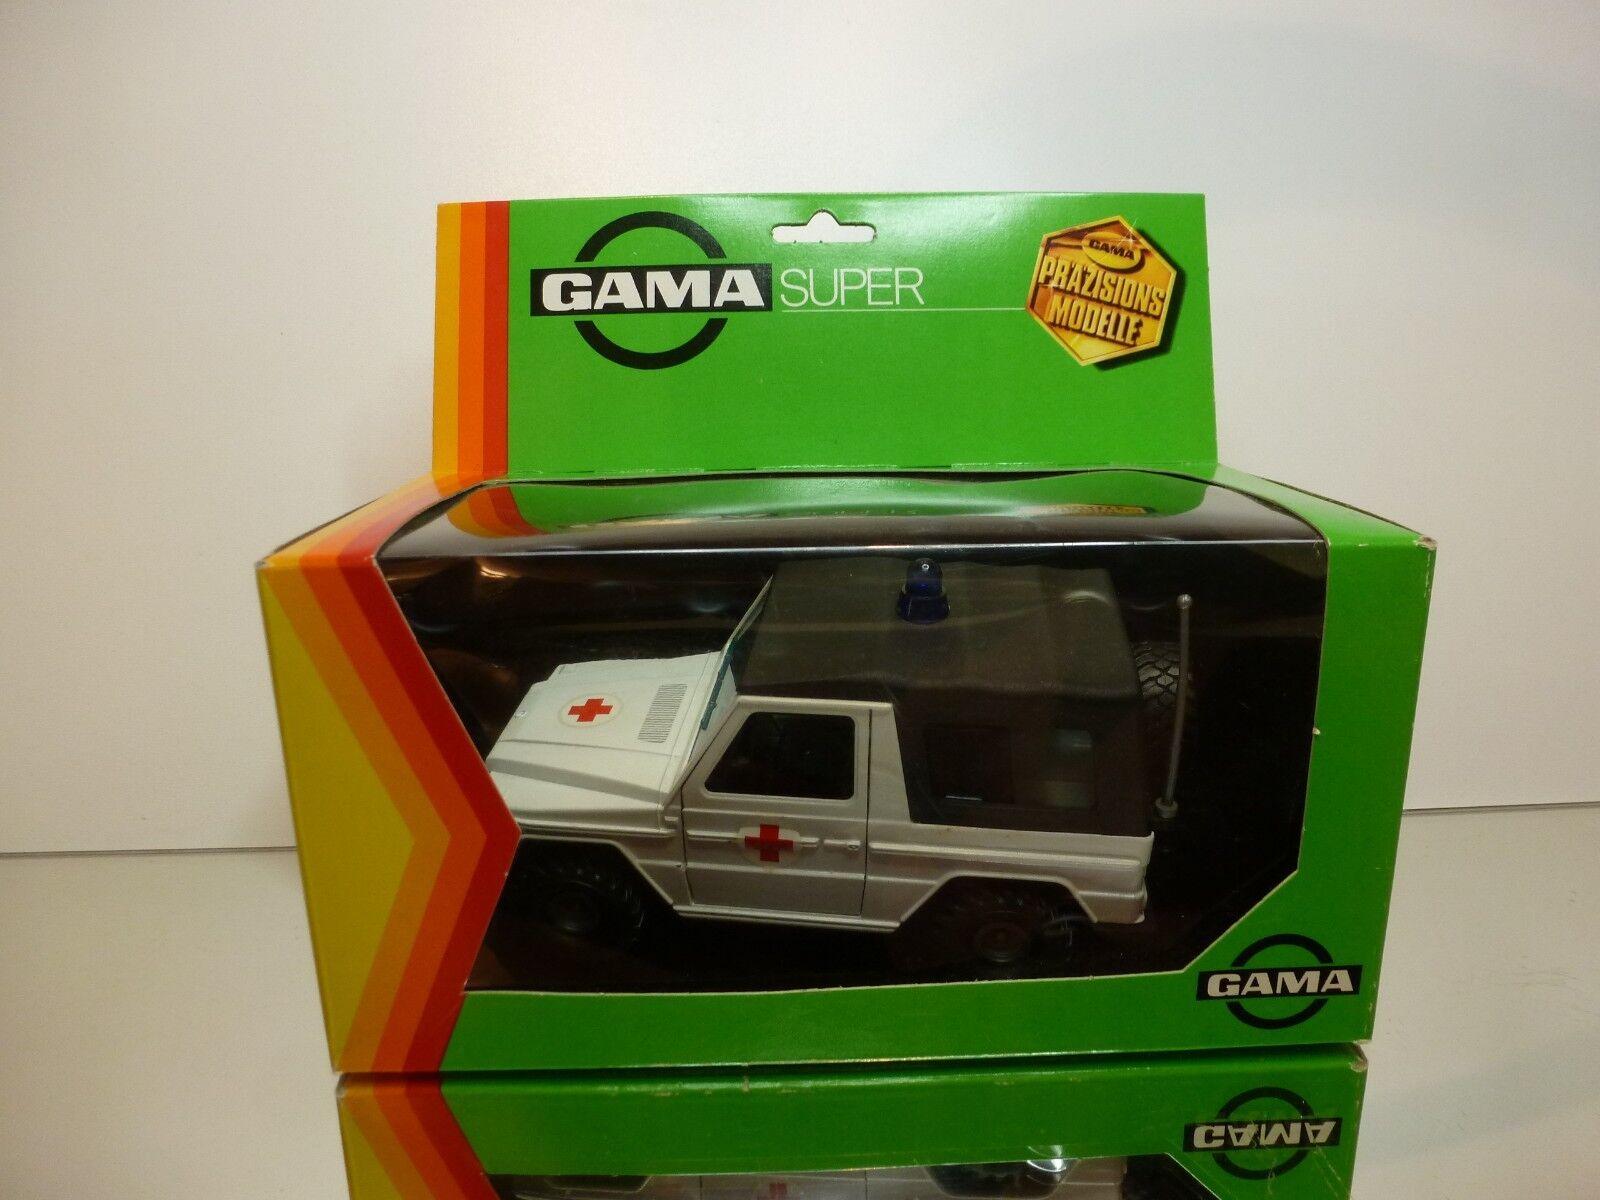 GAMA SUPER 4451 MERCEDES BENZ G-CLASS  RETTUNGSWAGEN - 1  24 - VERY GOOD IN BOX  grosses économies